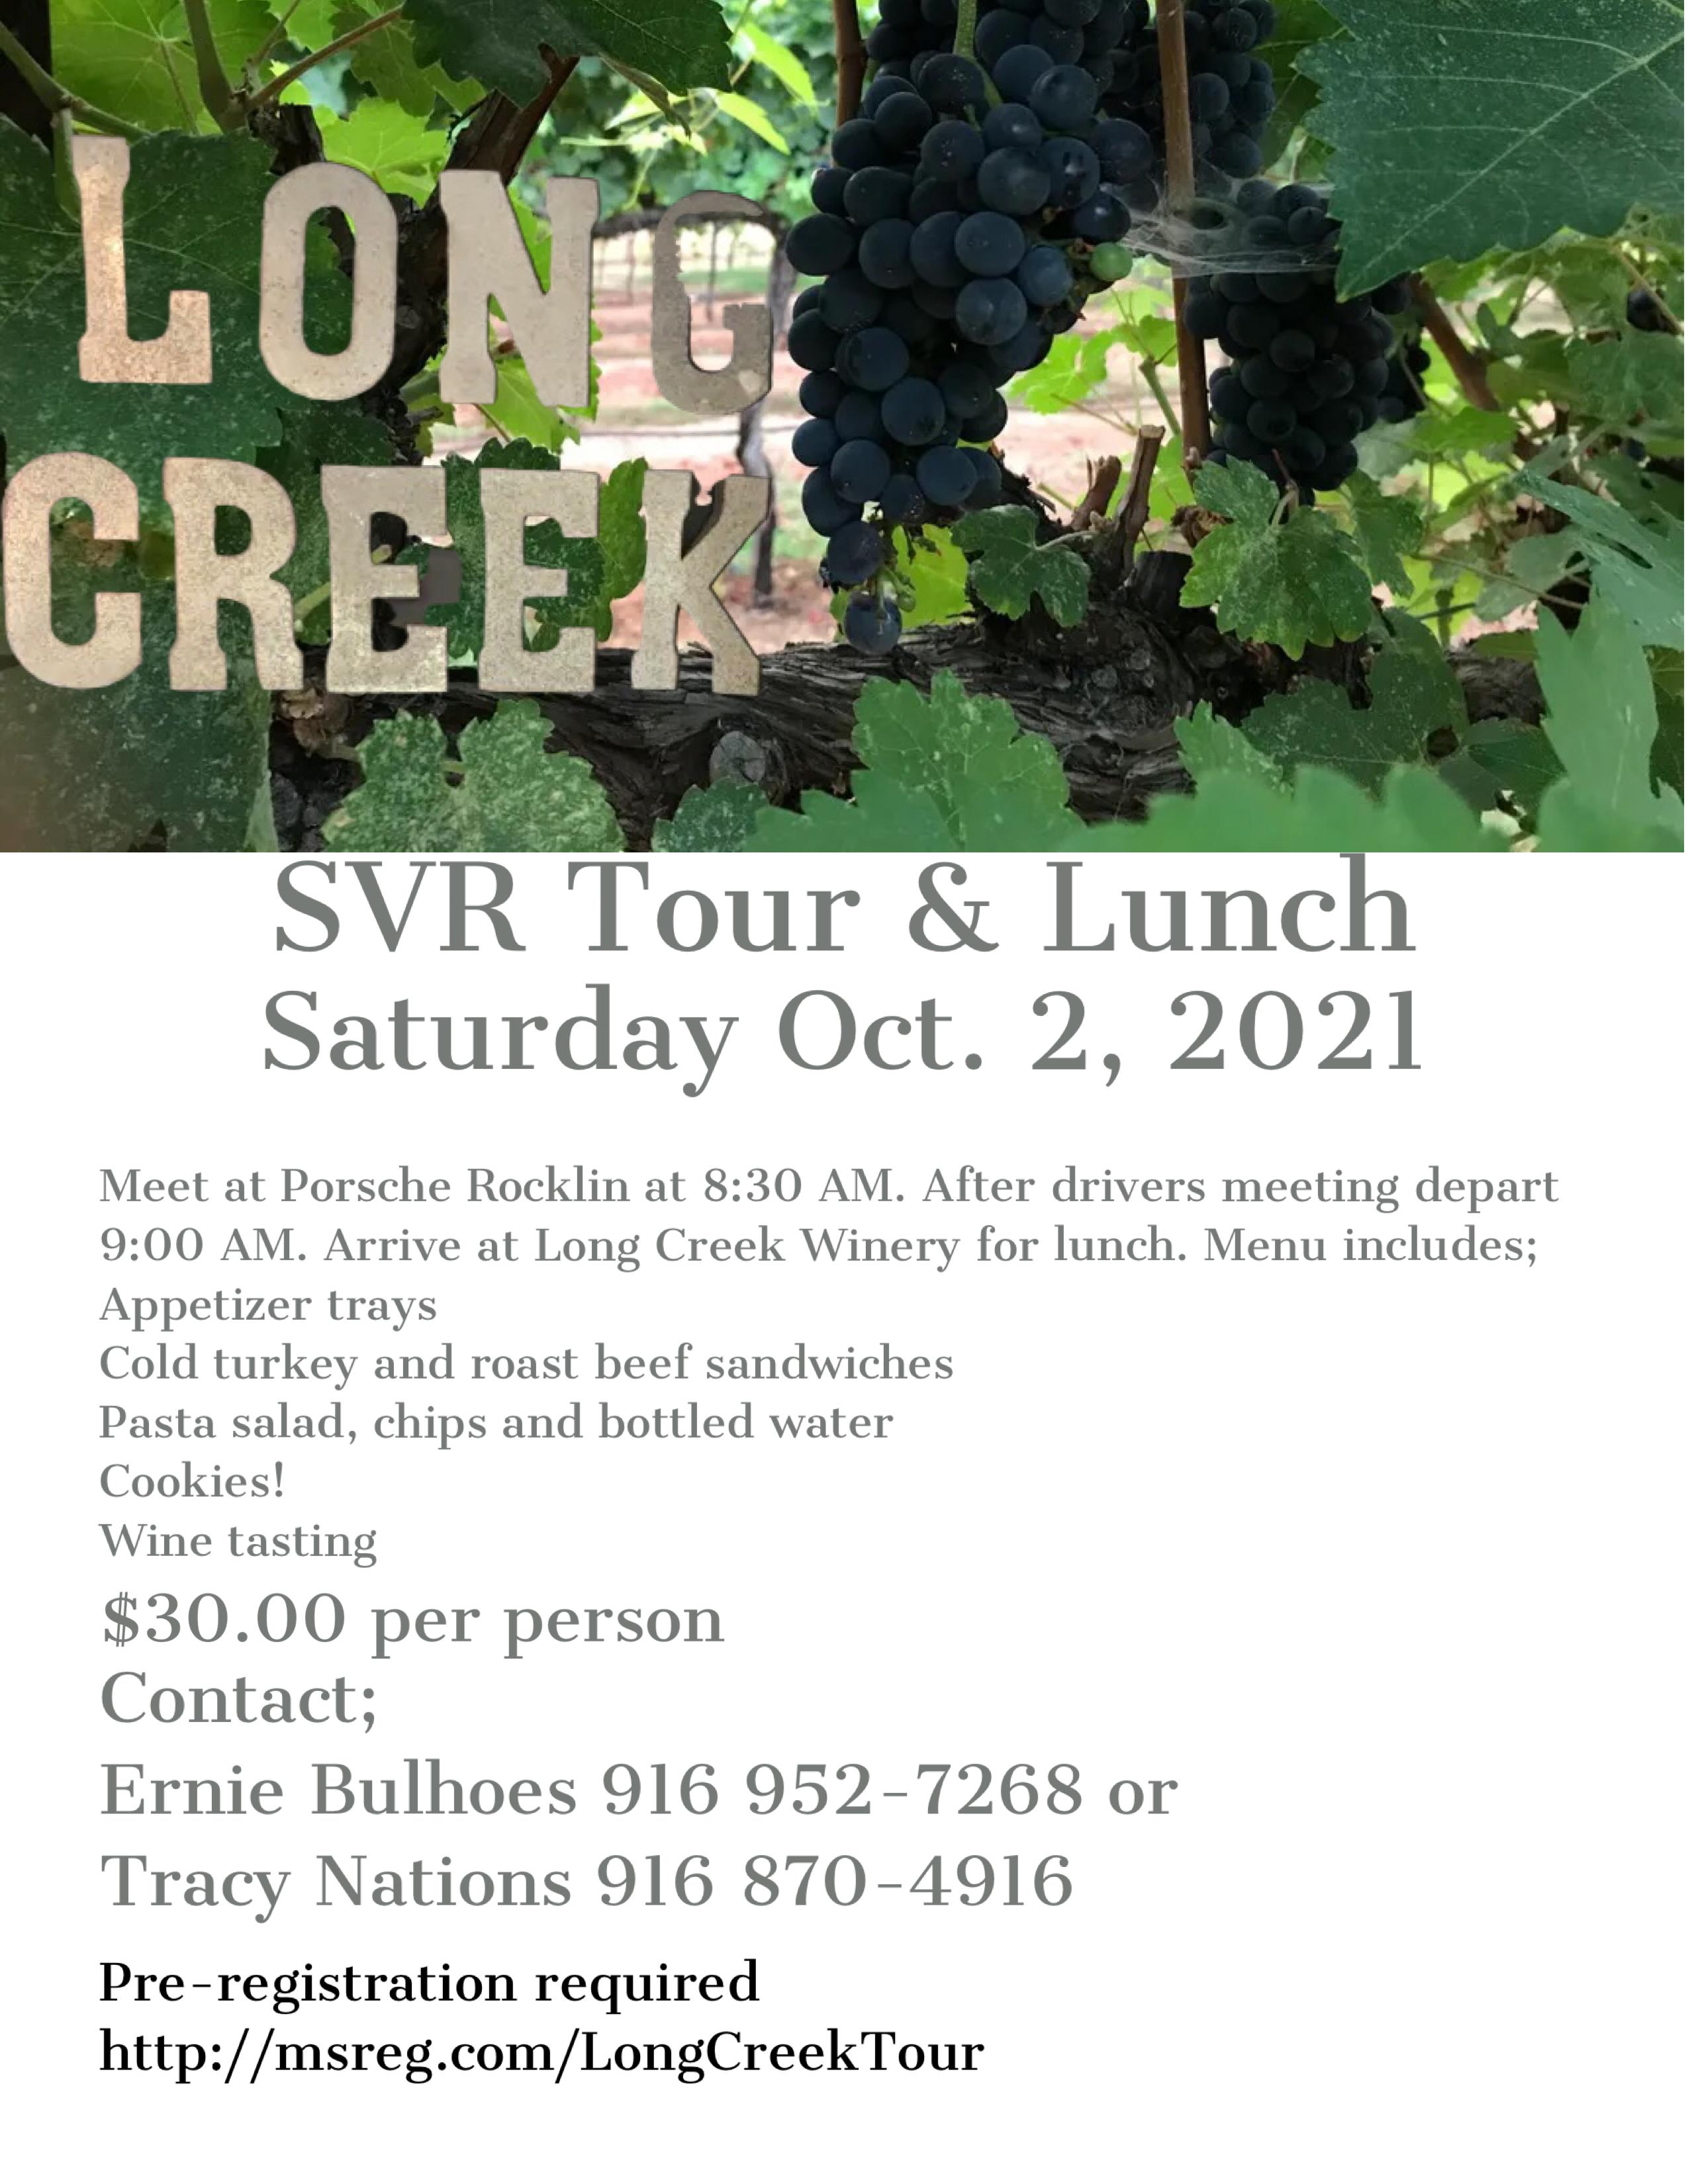 Long Creek Winery Tour & Lunch @ Long Creek Winery